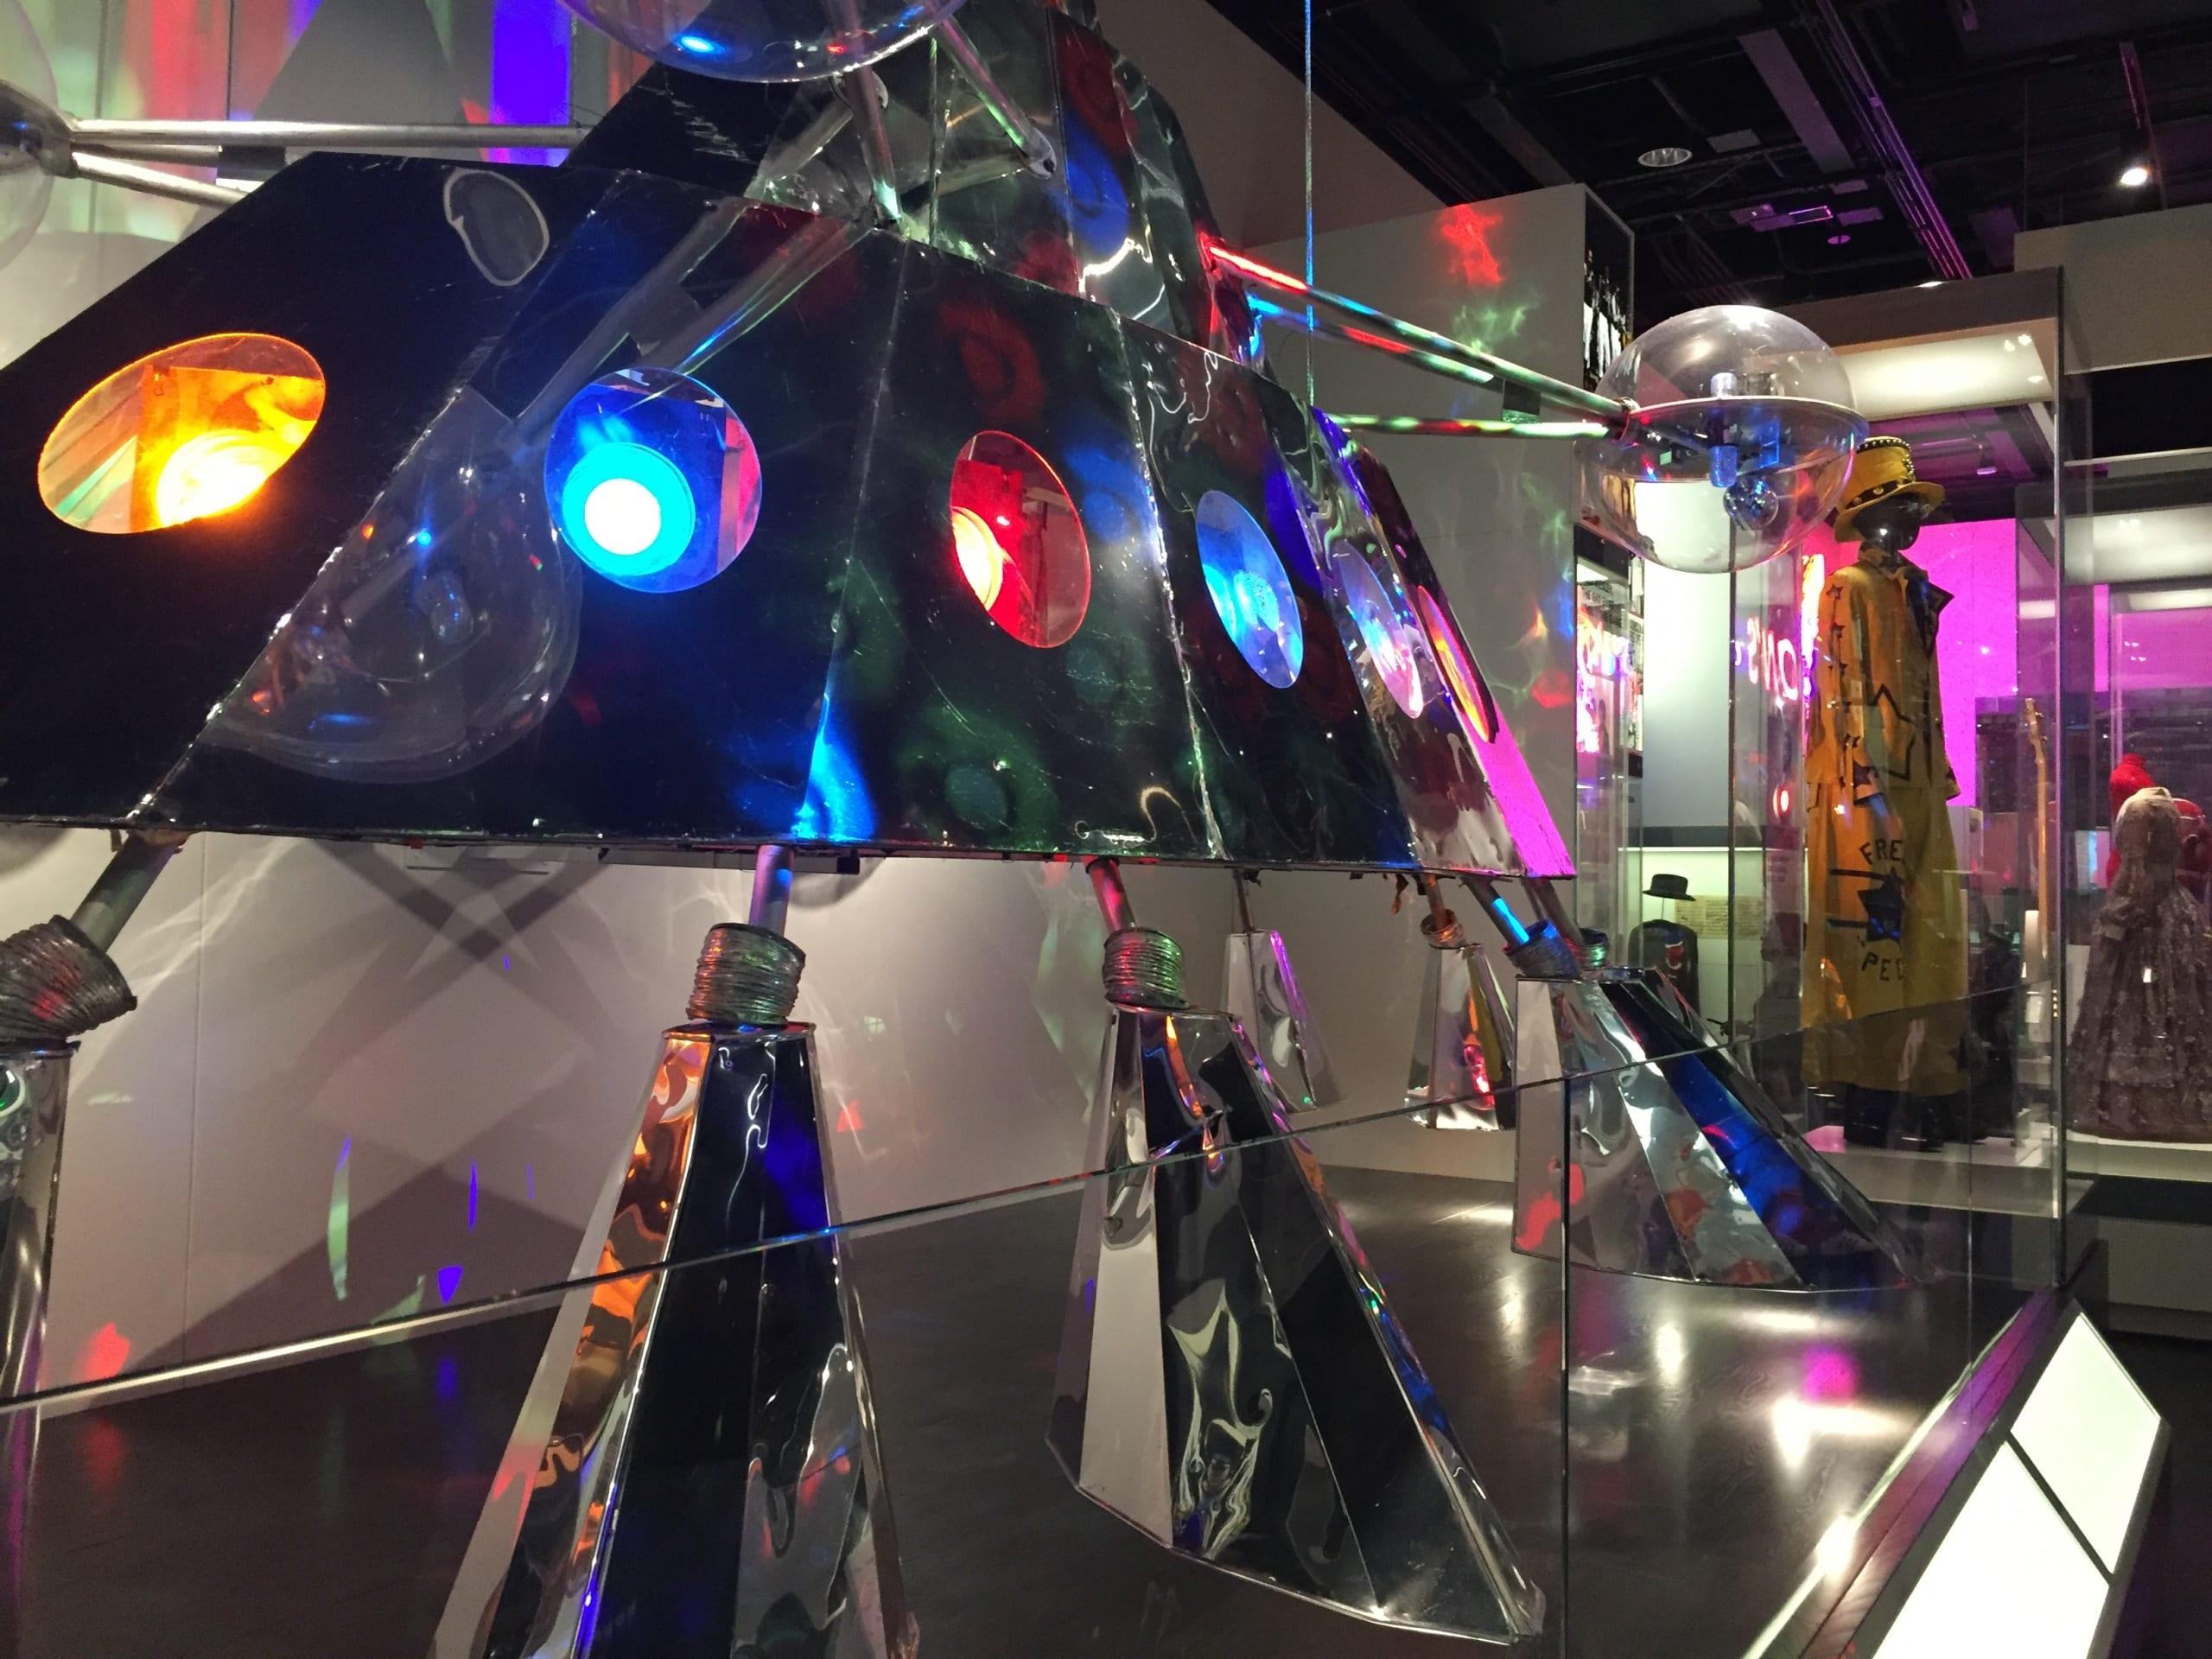 metal space ship with flourescent lights on a platform